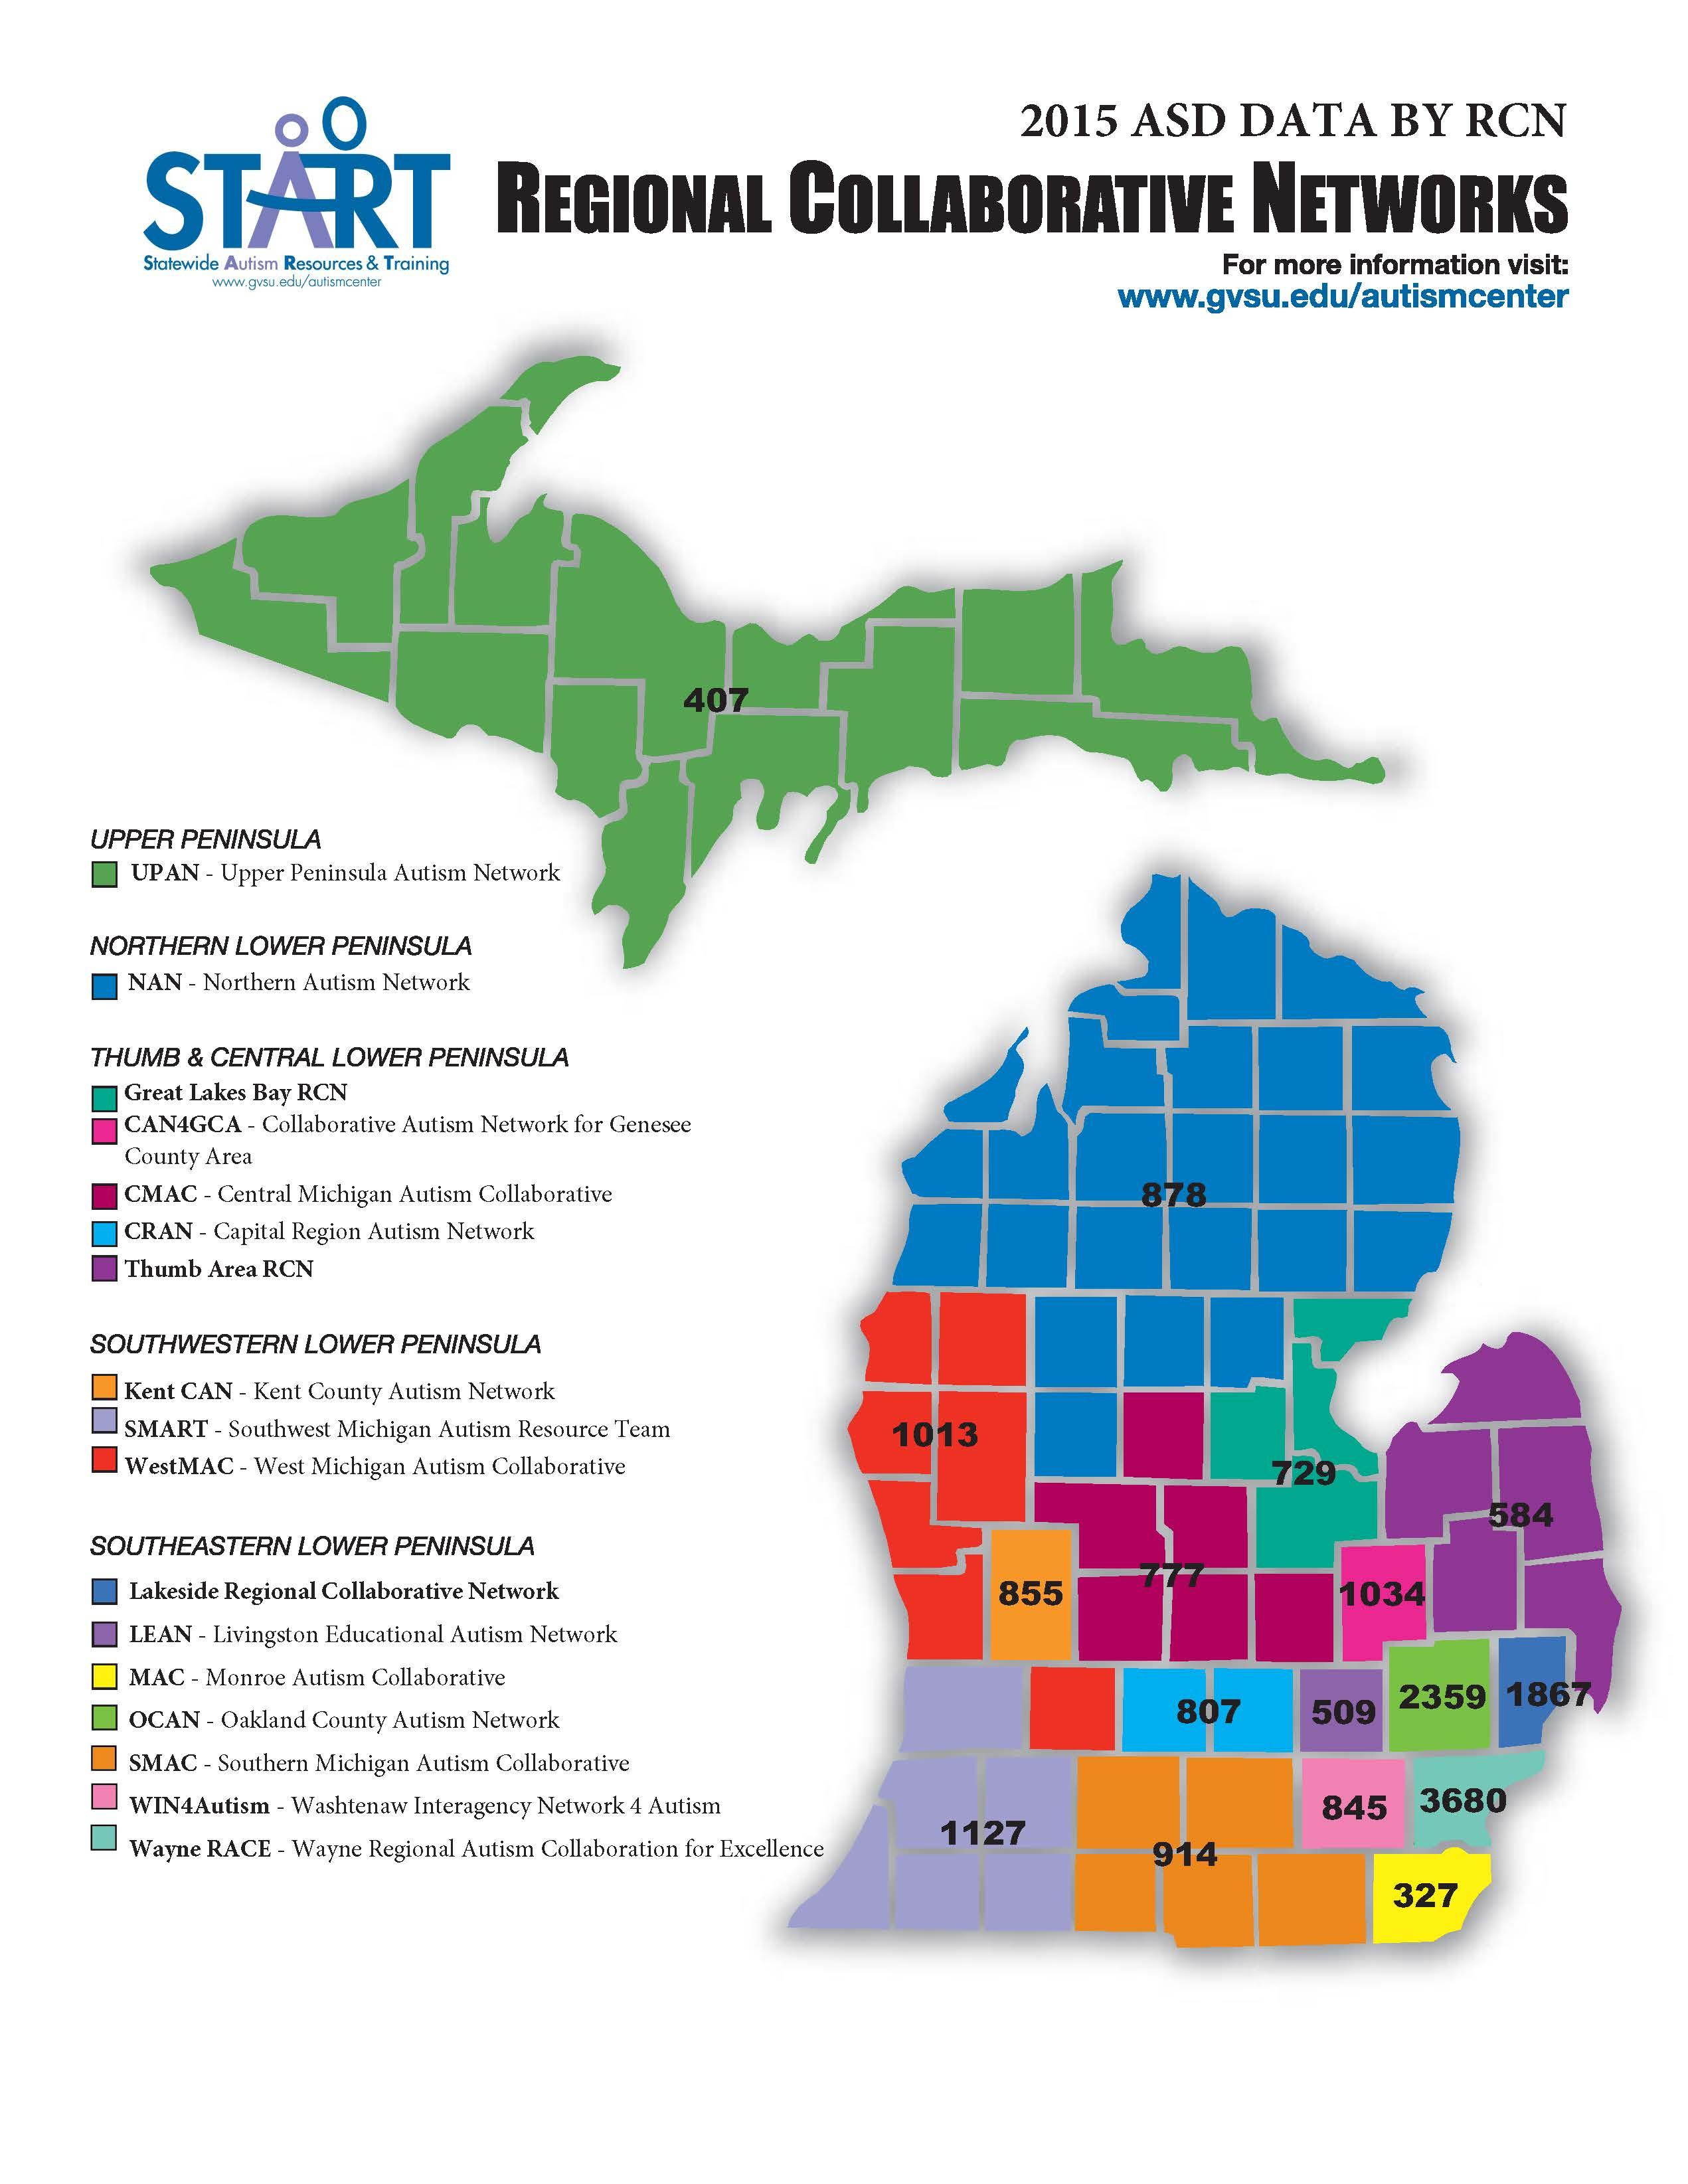 RCN Map - 2015 Breakdown of ASD Students